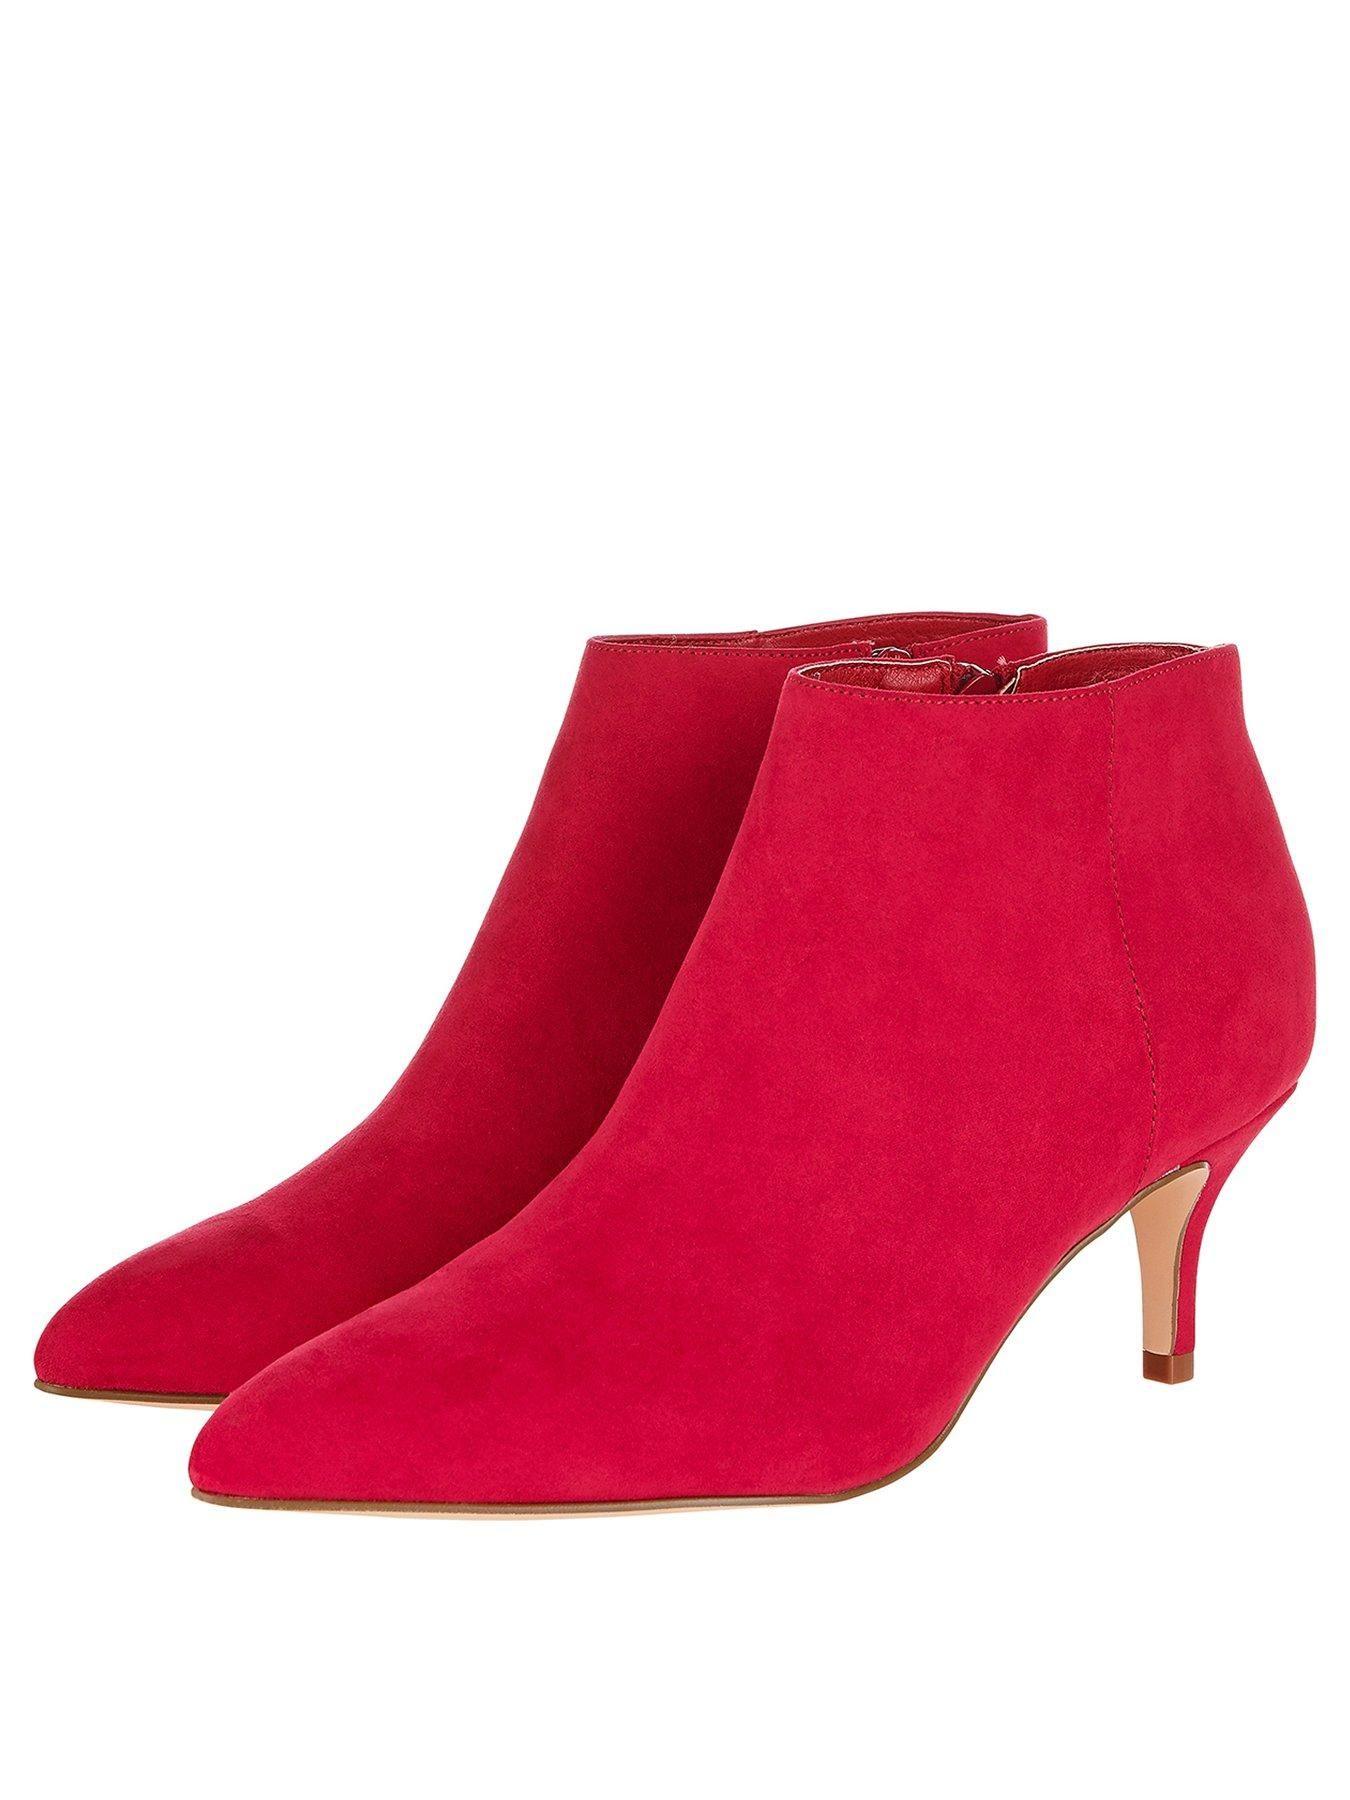 Littlewoods Ireland Online Shopping Fashion Homeware Pointed Boots Kitten Heels Heels